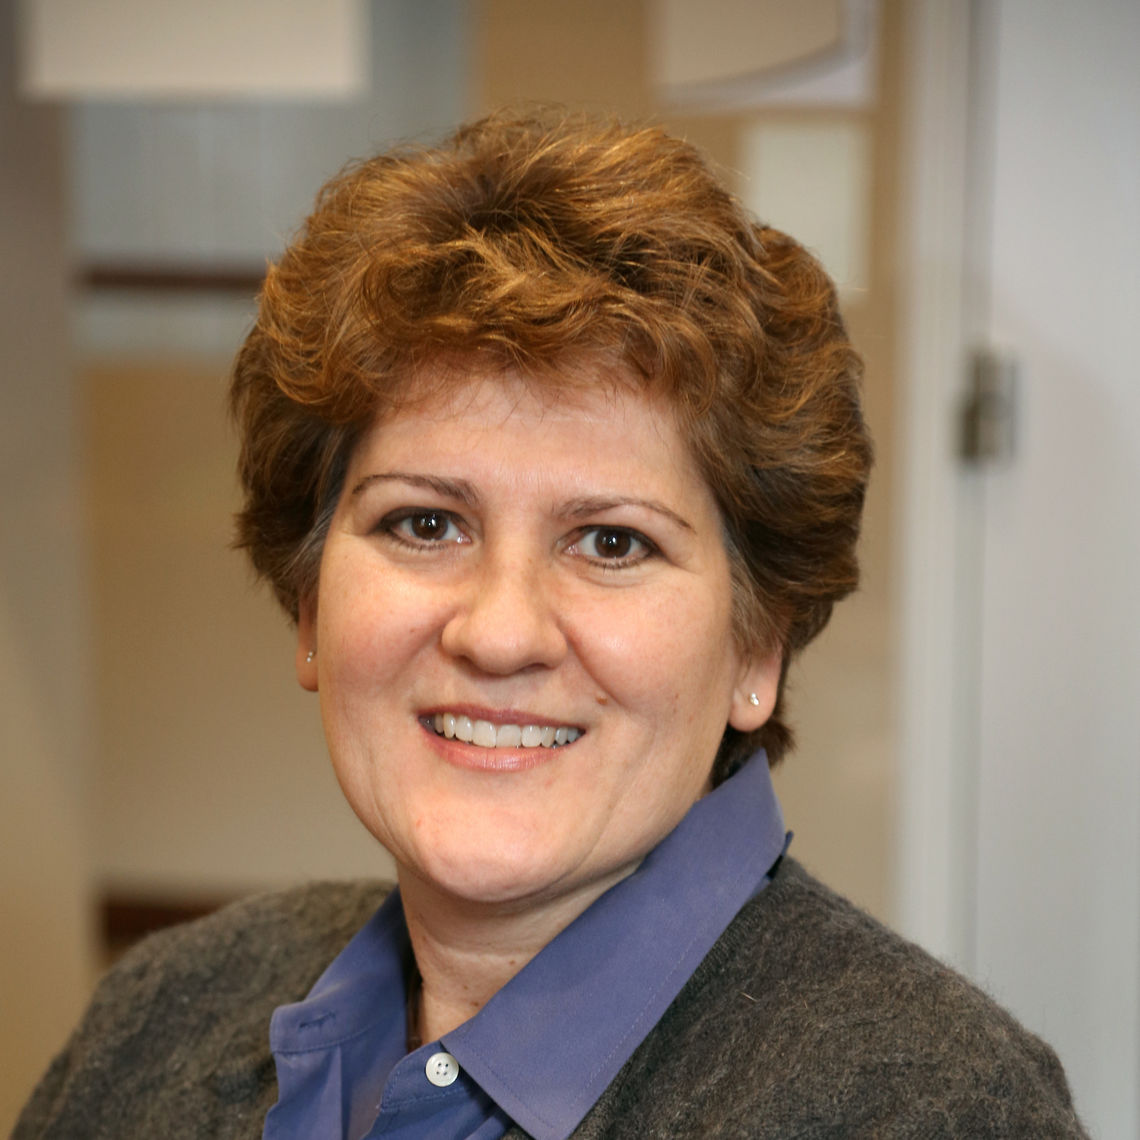 Dr. Susan Dicklitch-Nelson